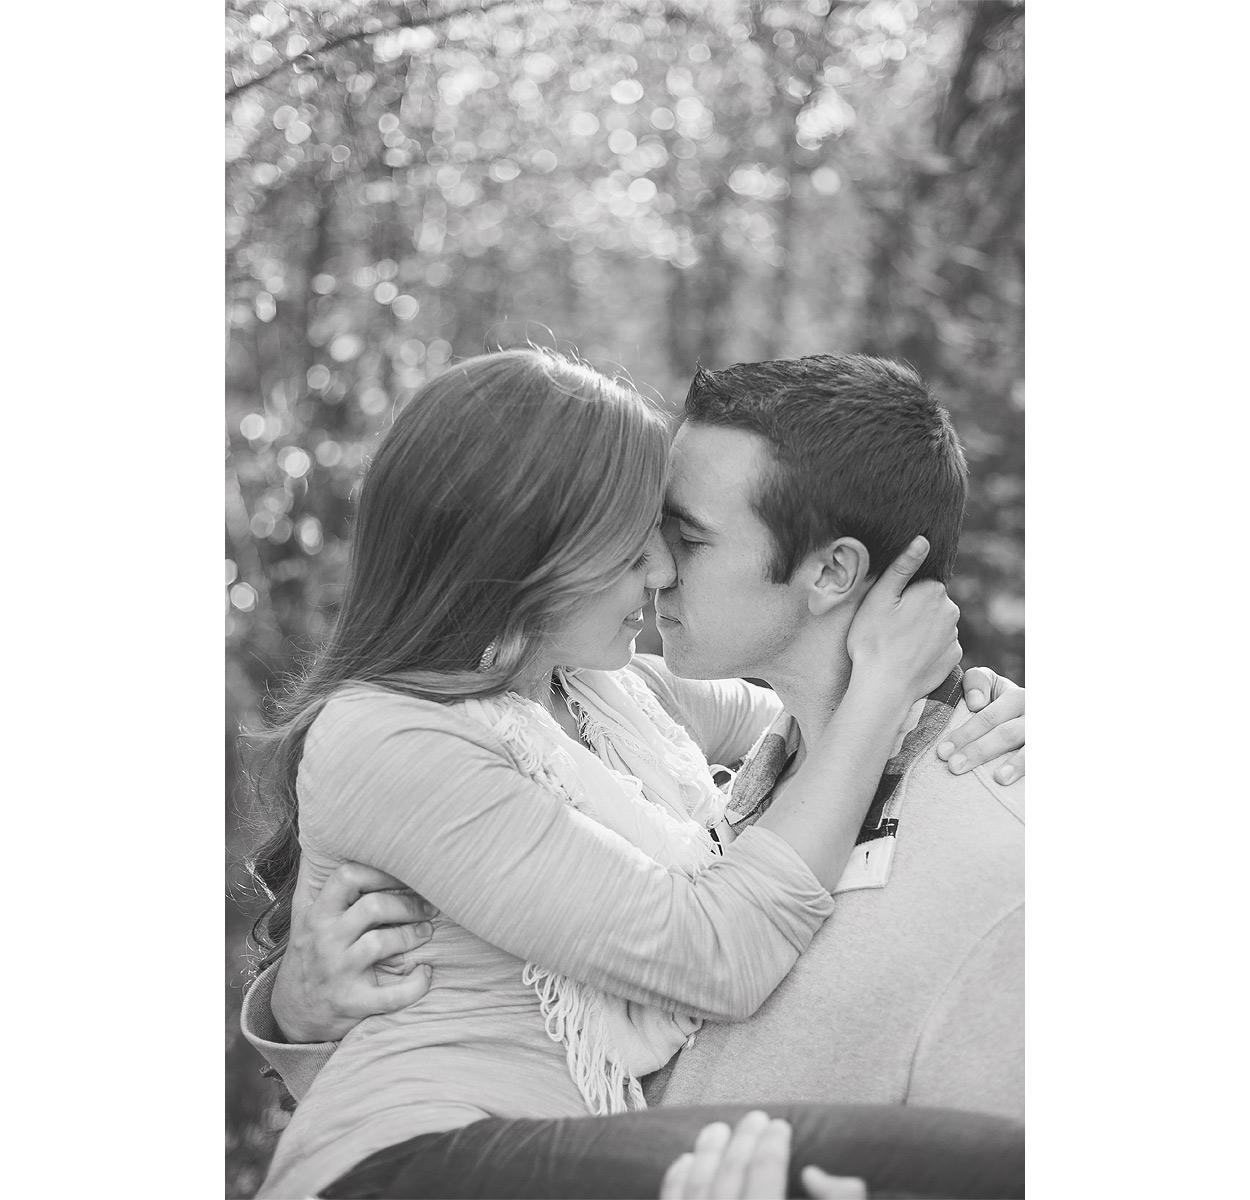 Logan-UT-Engagement-Photography-HeidiRandallStudios-TiffanyBryan-9.jpg